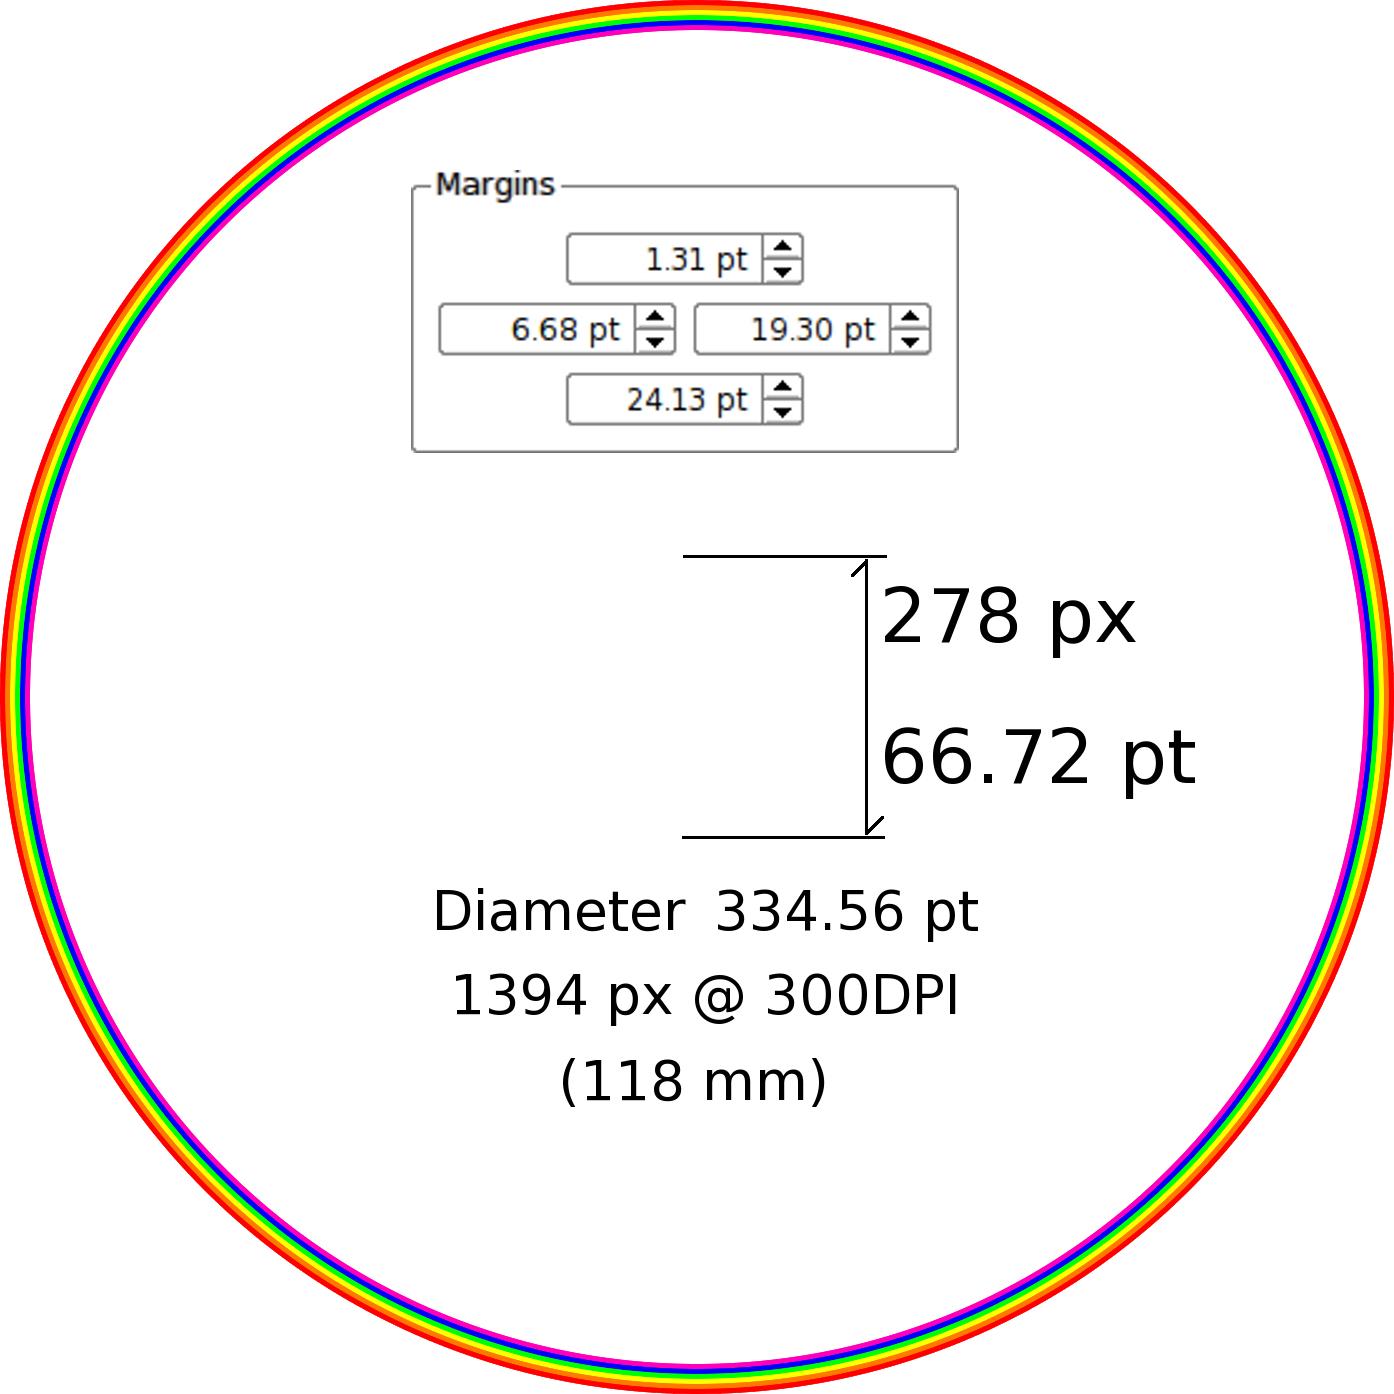 size of a dvd - Siteze